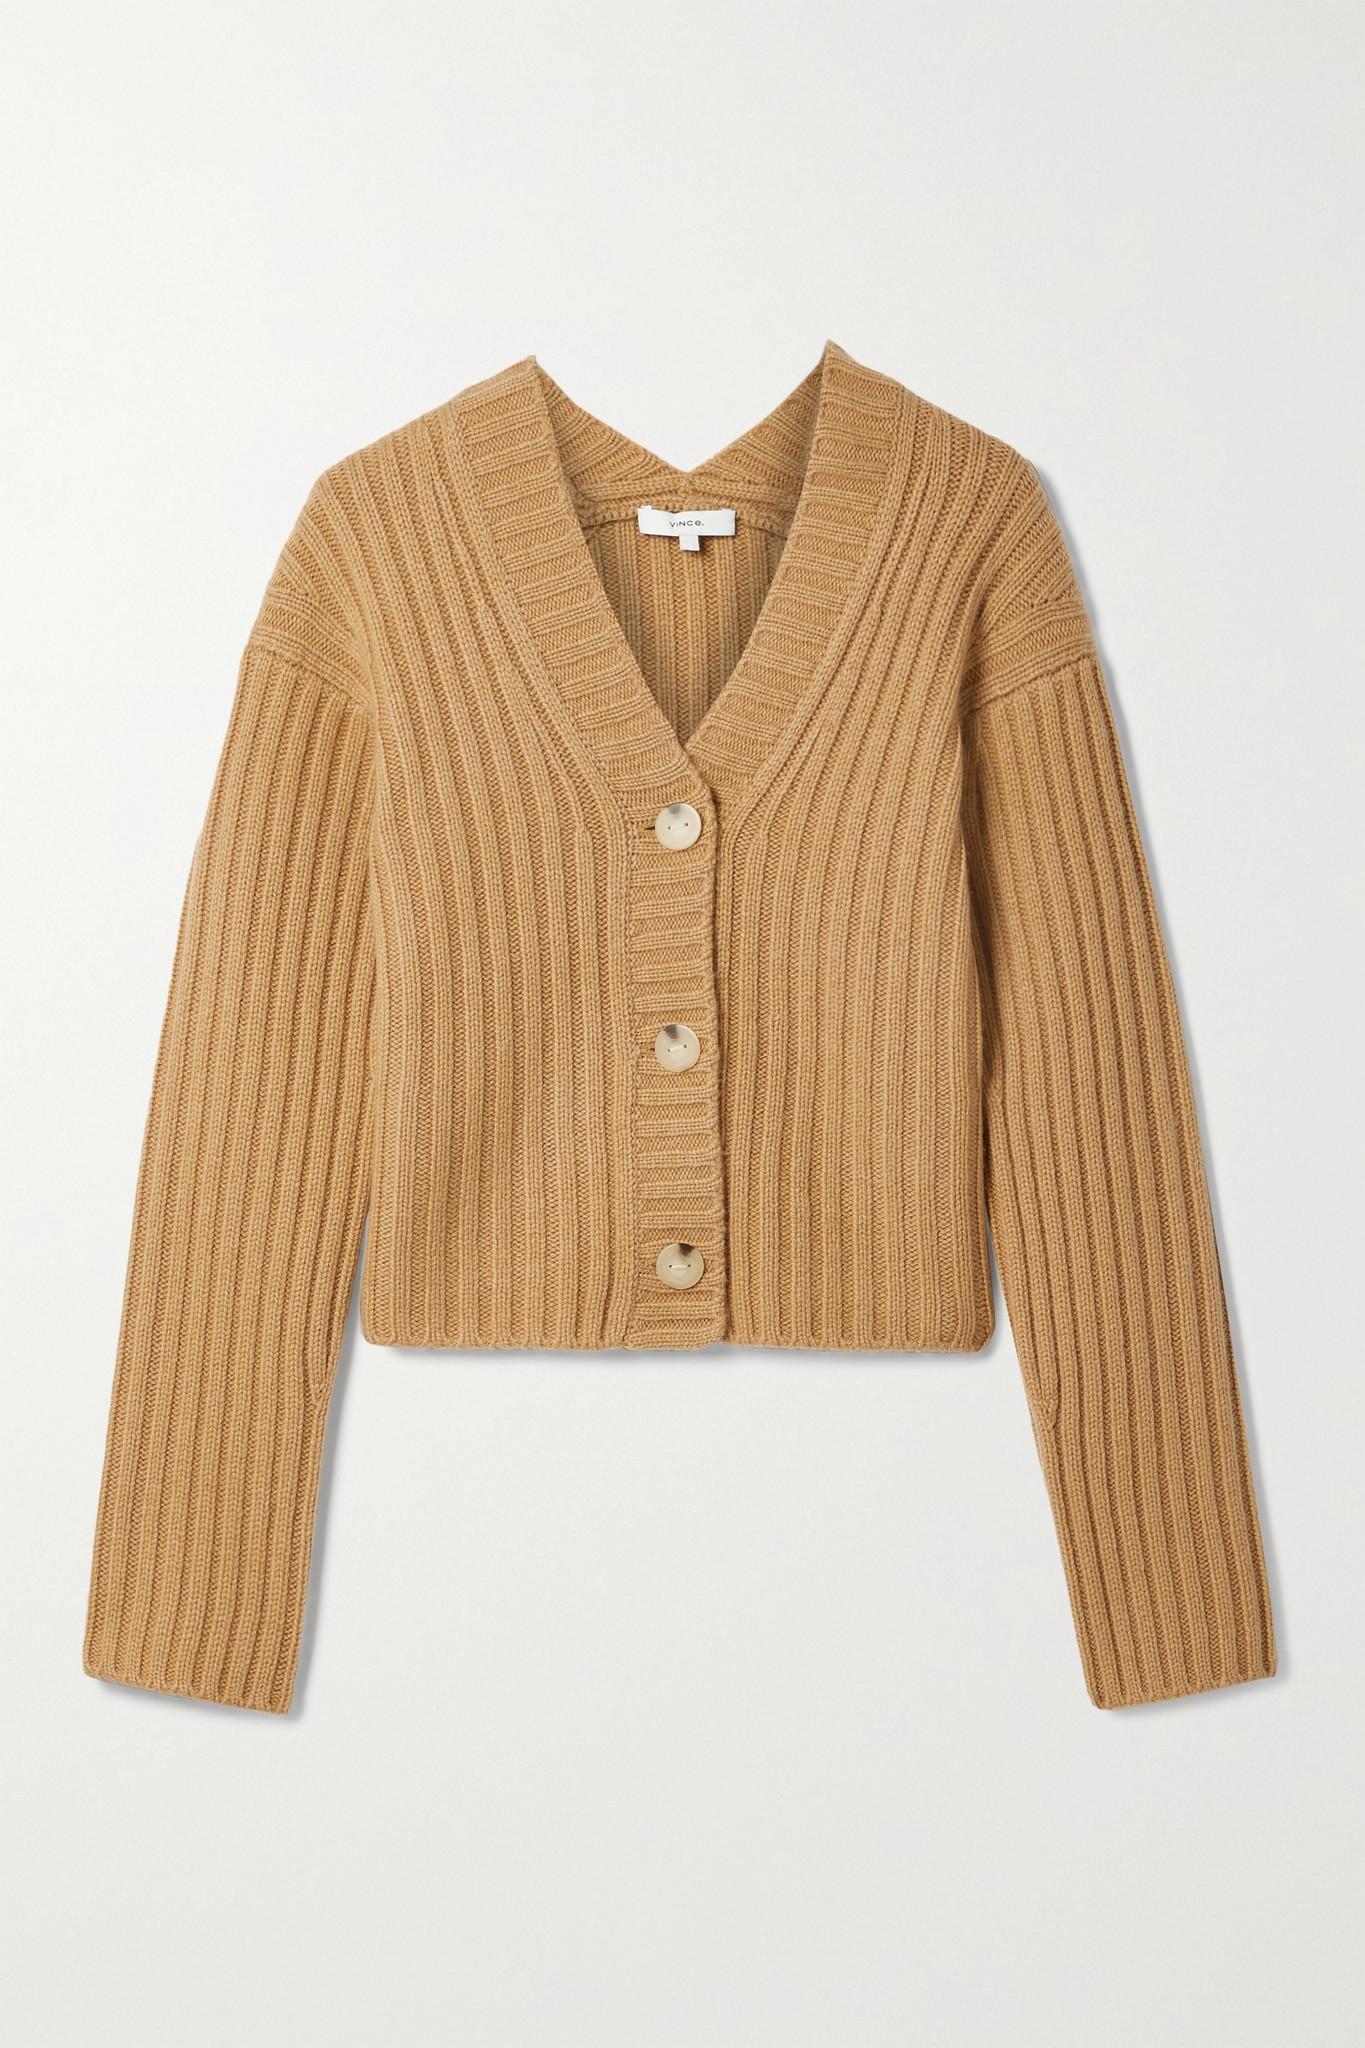 VINCE - 罗纹羊毛羊绒混纺短款开襟衫 - 中性色 - x large